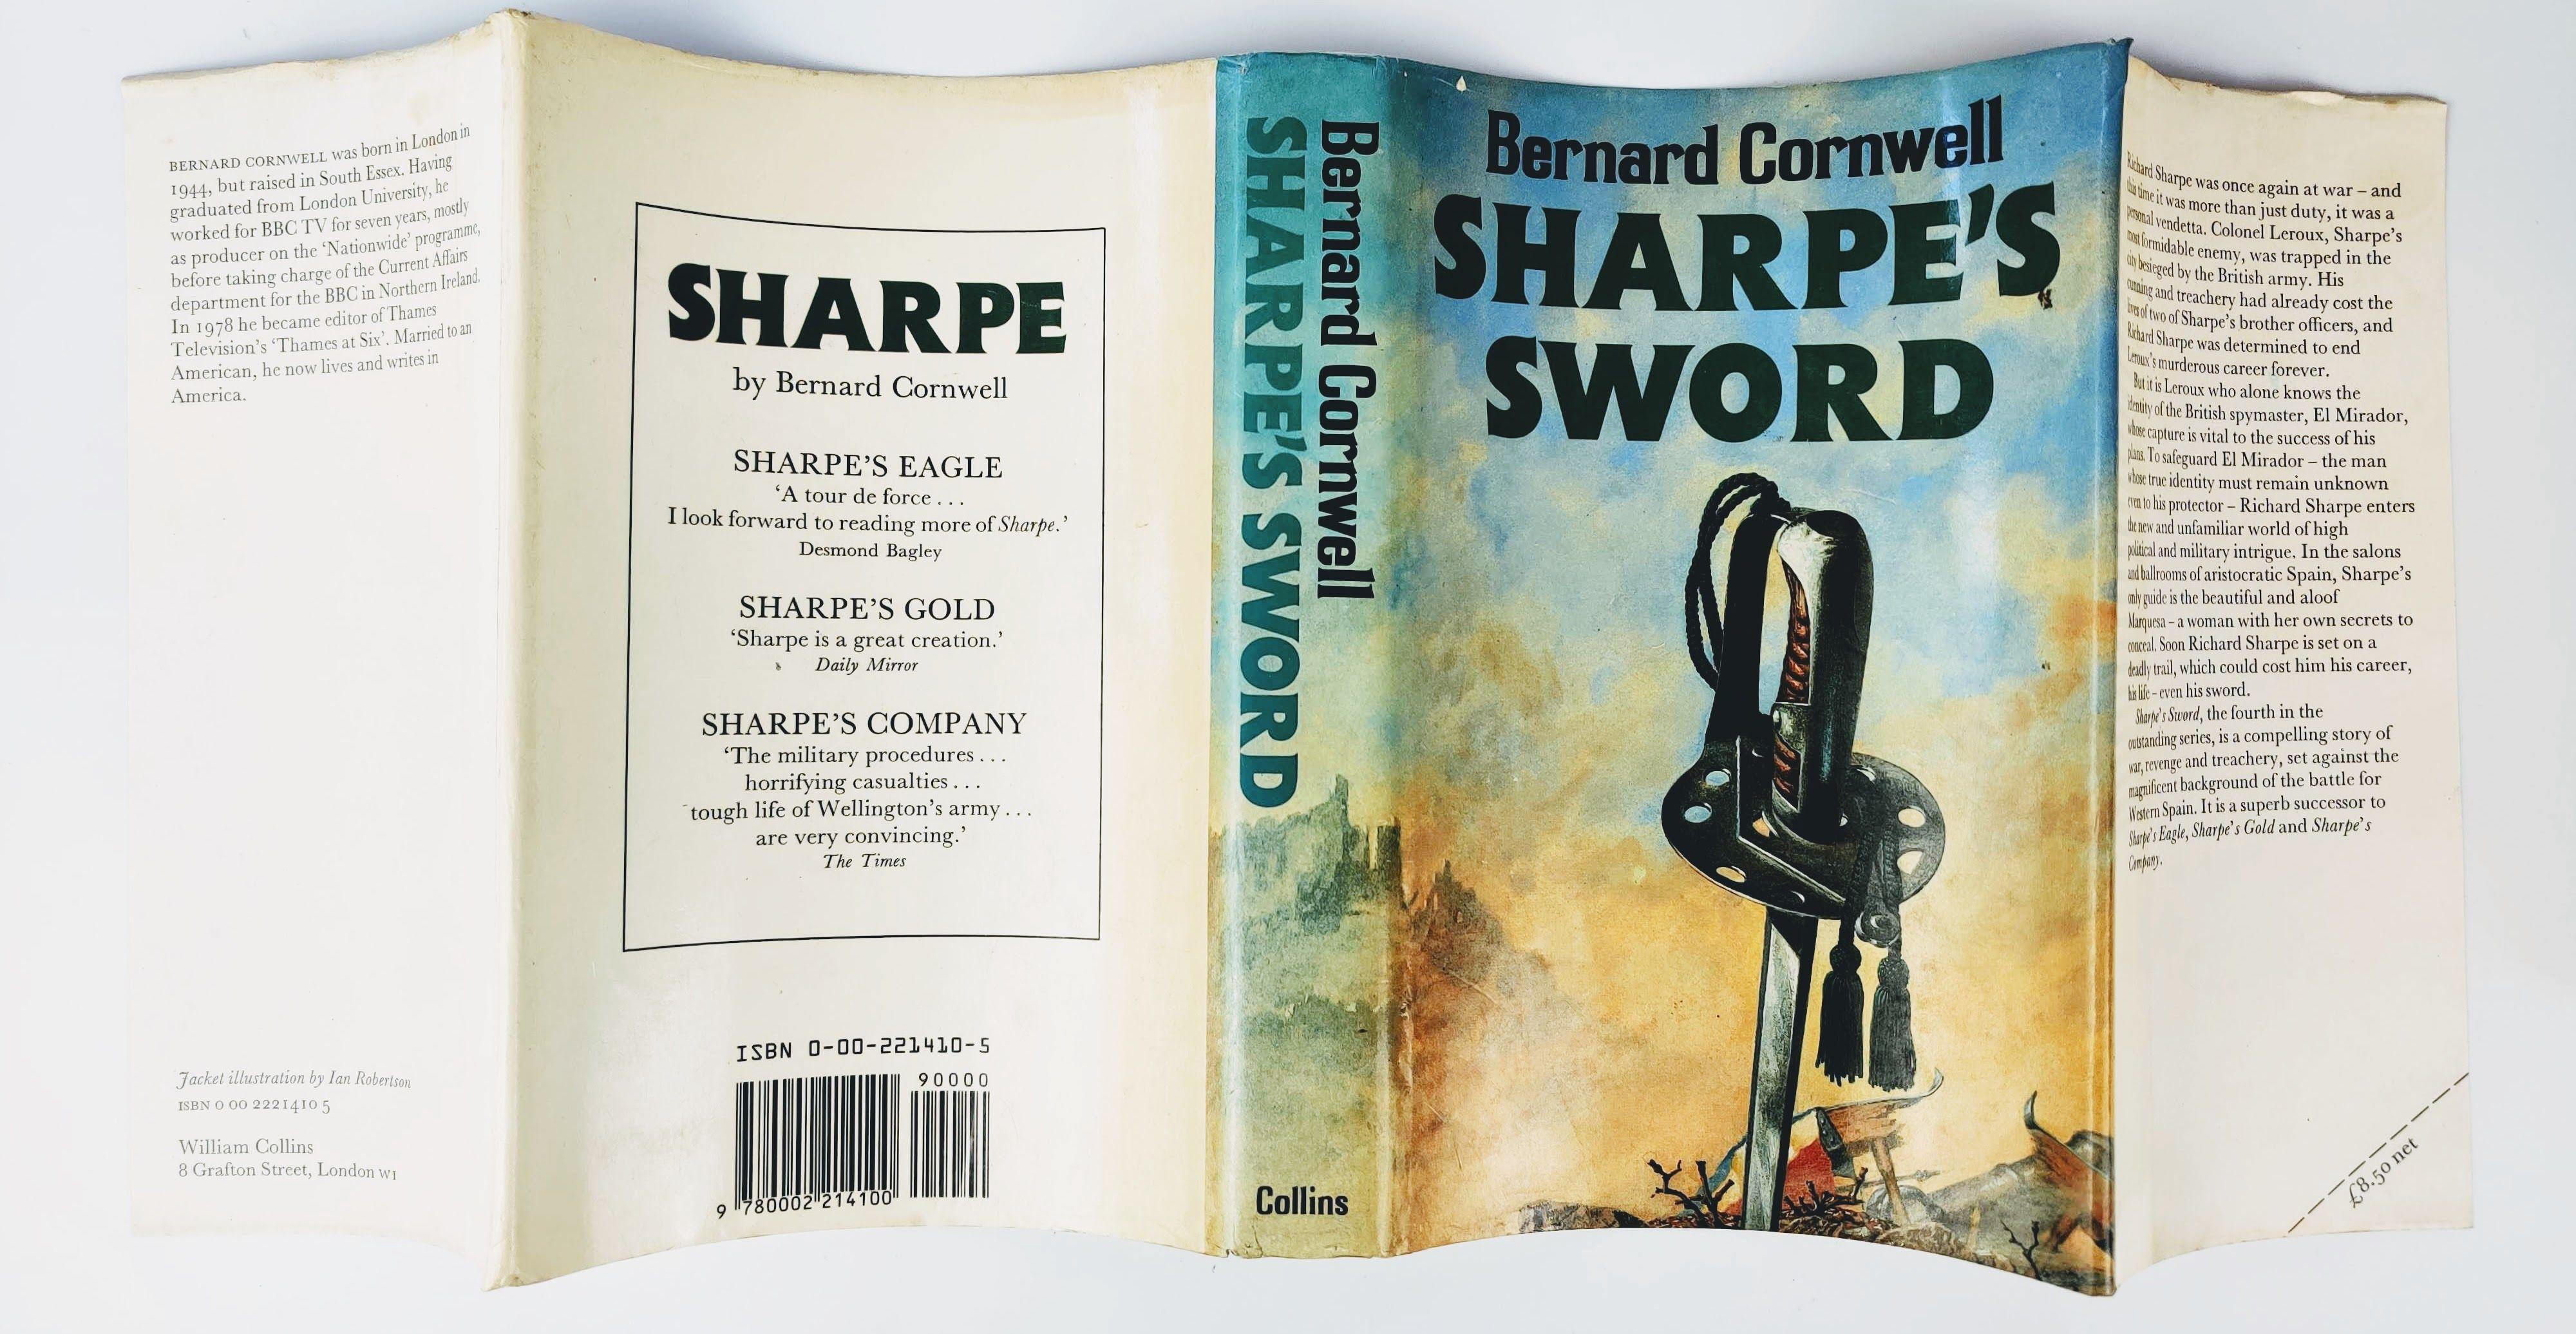 Sharpe's Sword (photo 4)